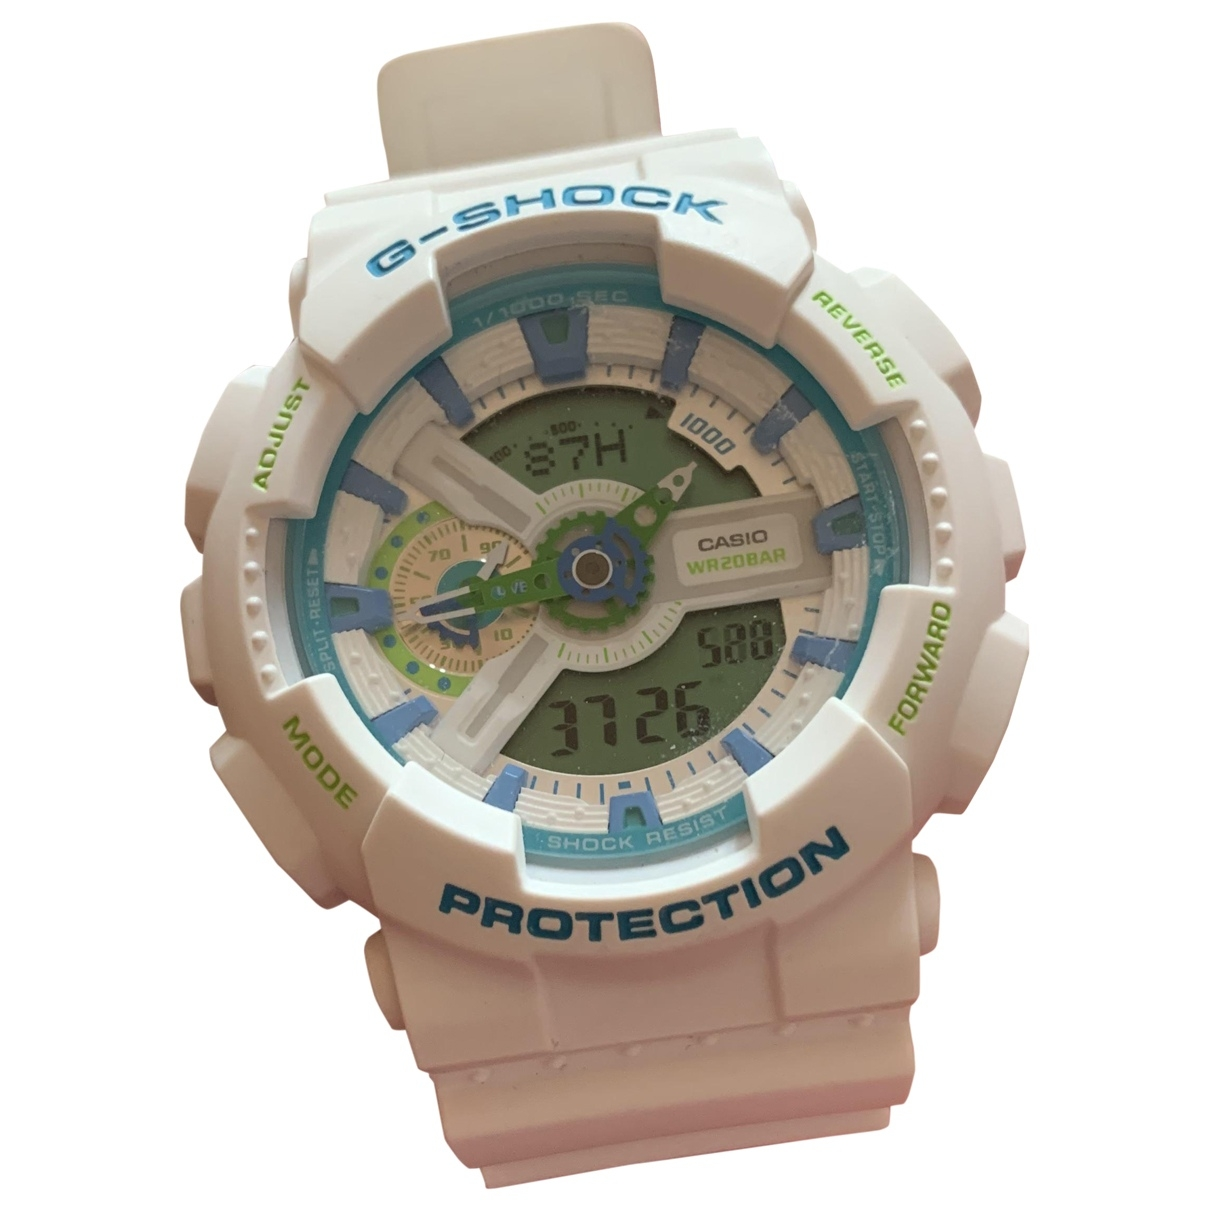 G-shock \N White Rubber watch for Men \N